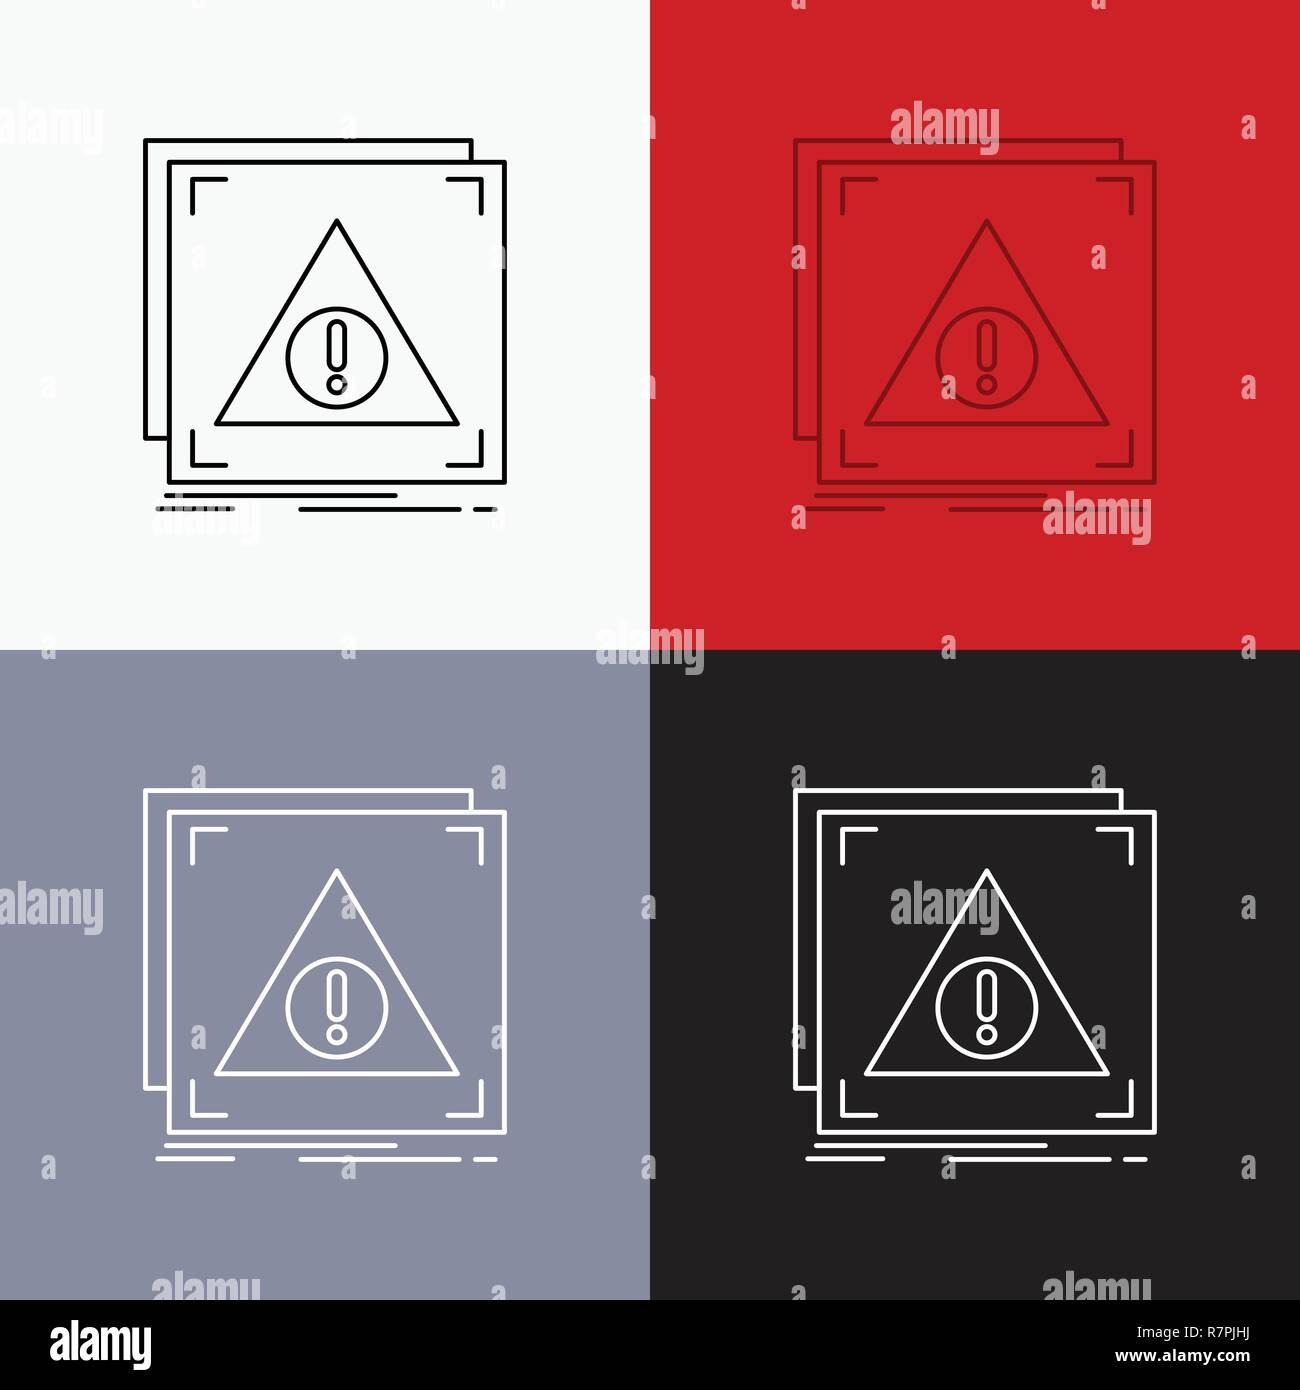 Error, Application, Denied, server, alert Icon Over Various Background. Line style design, designed for web and app. Eps 10 vector illustration - Stock Image